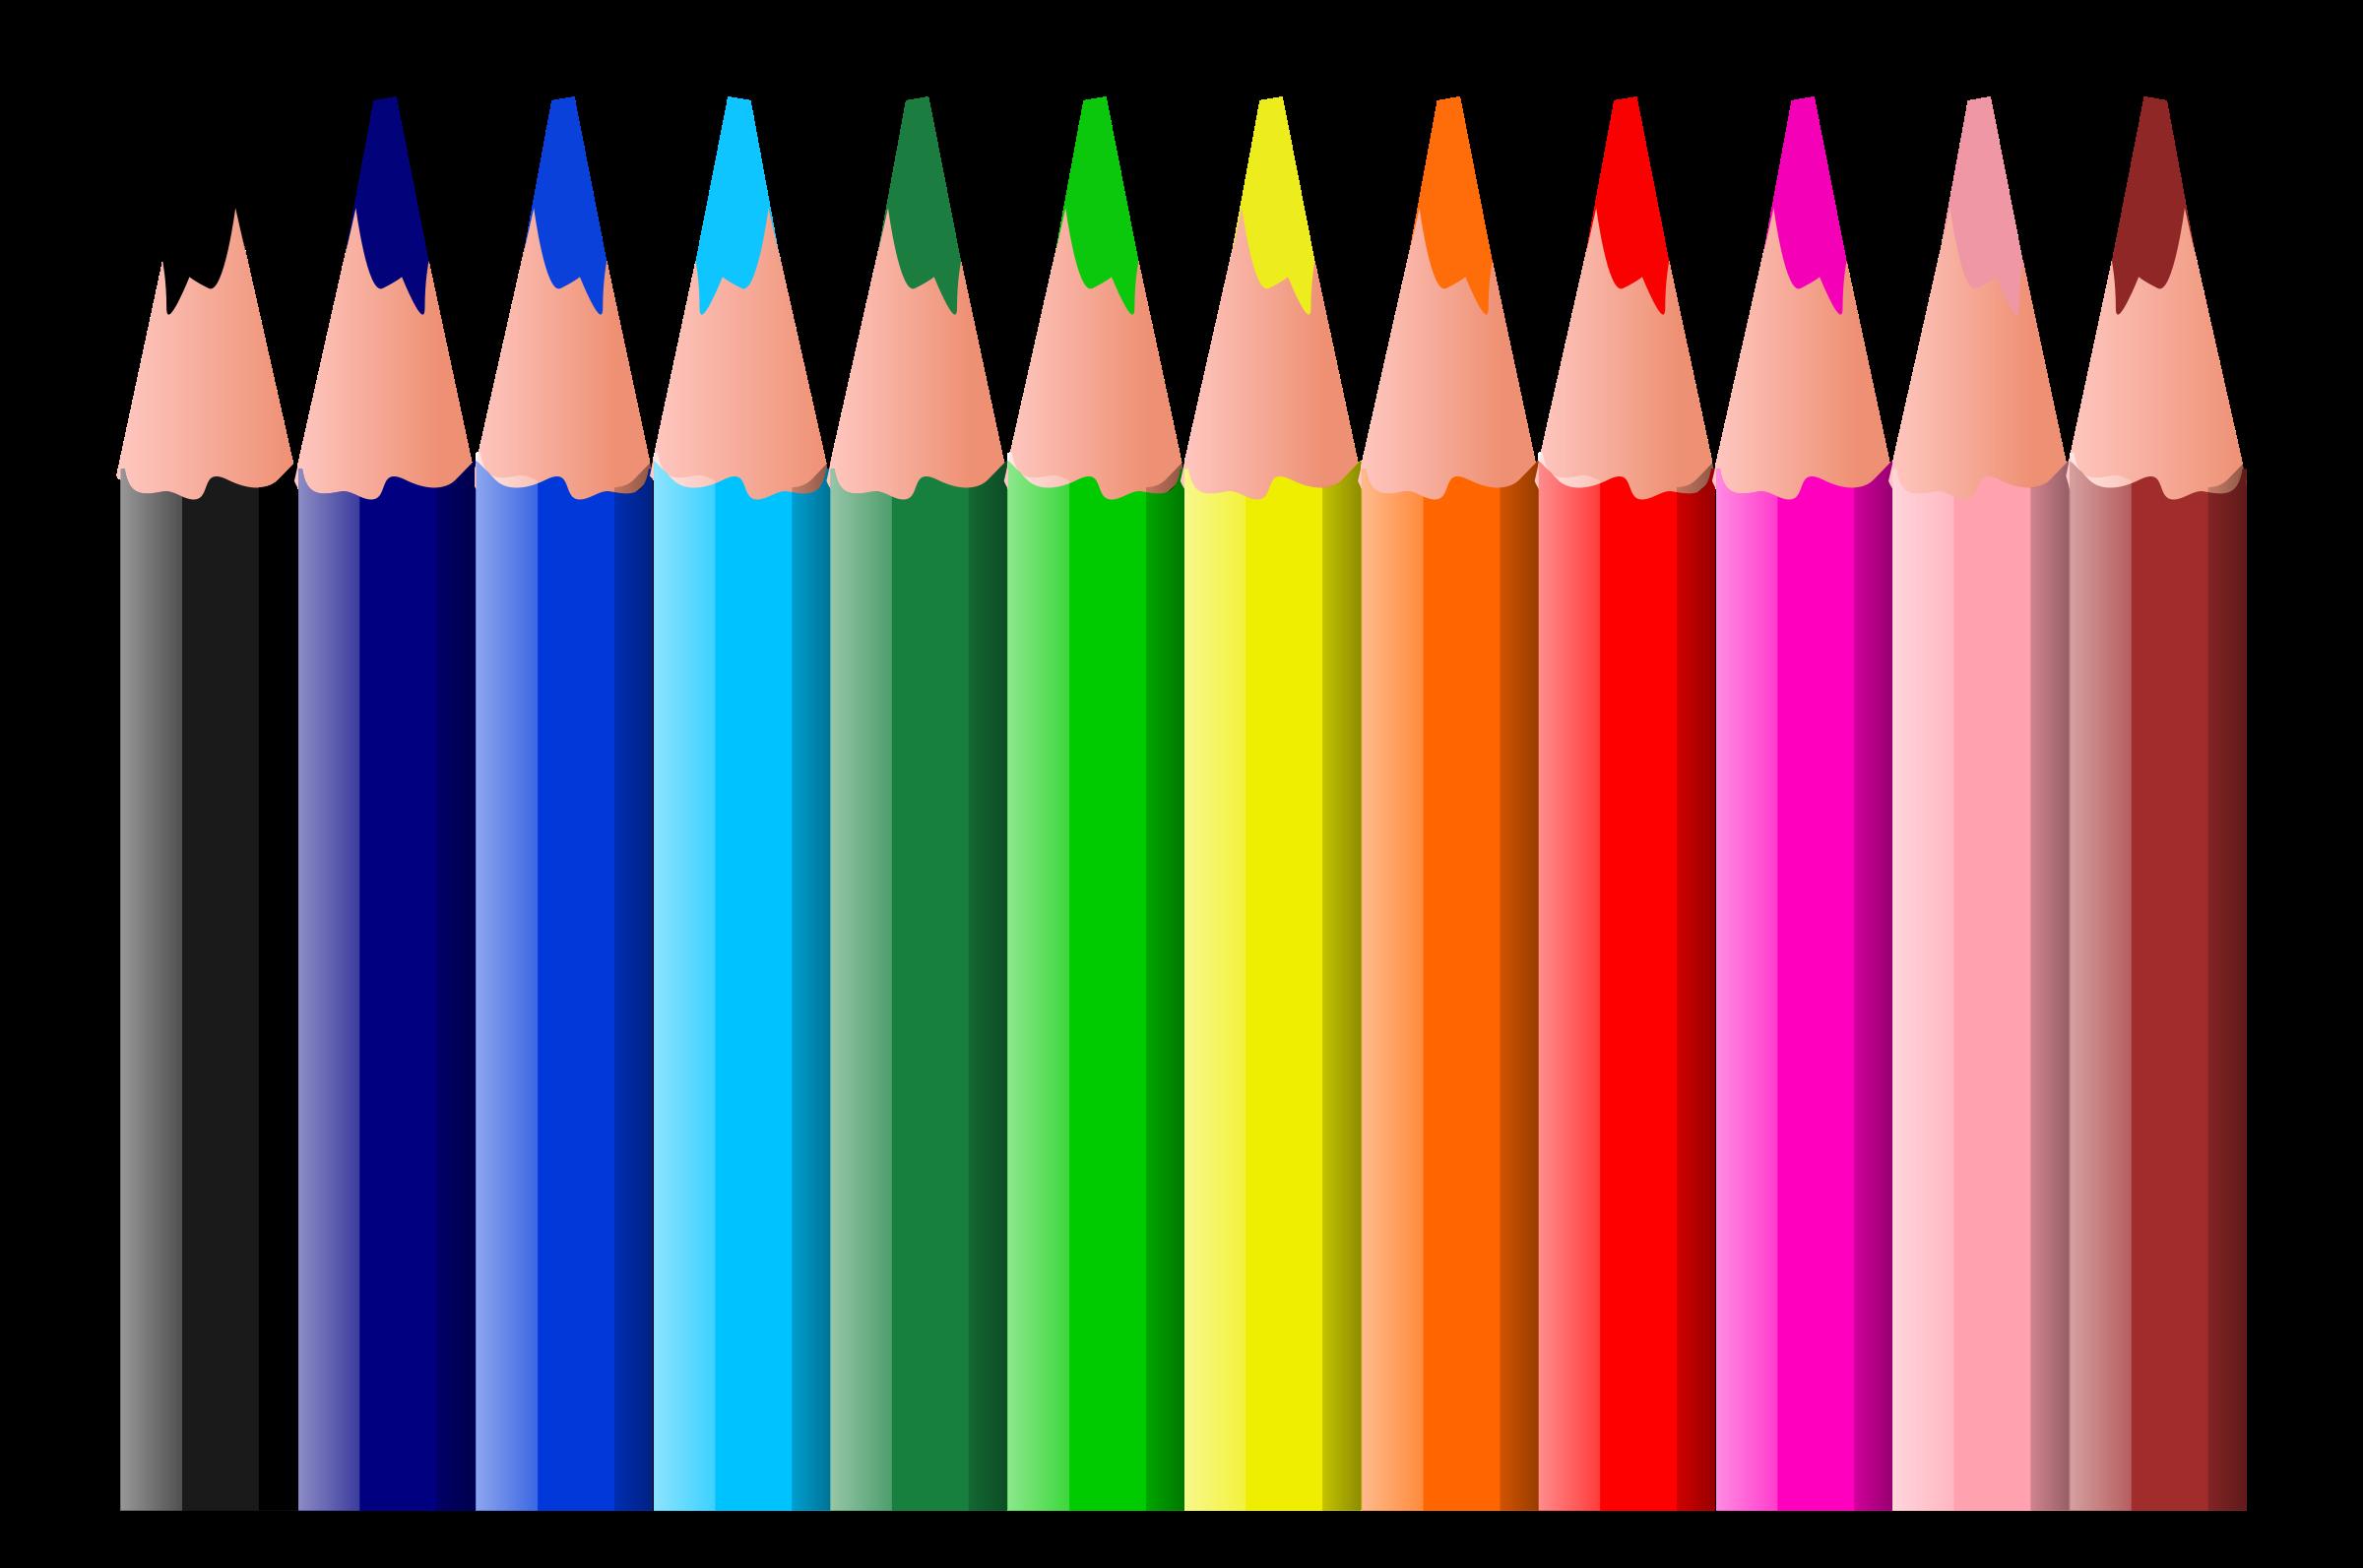 Clipart - Coloured Pencils